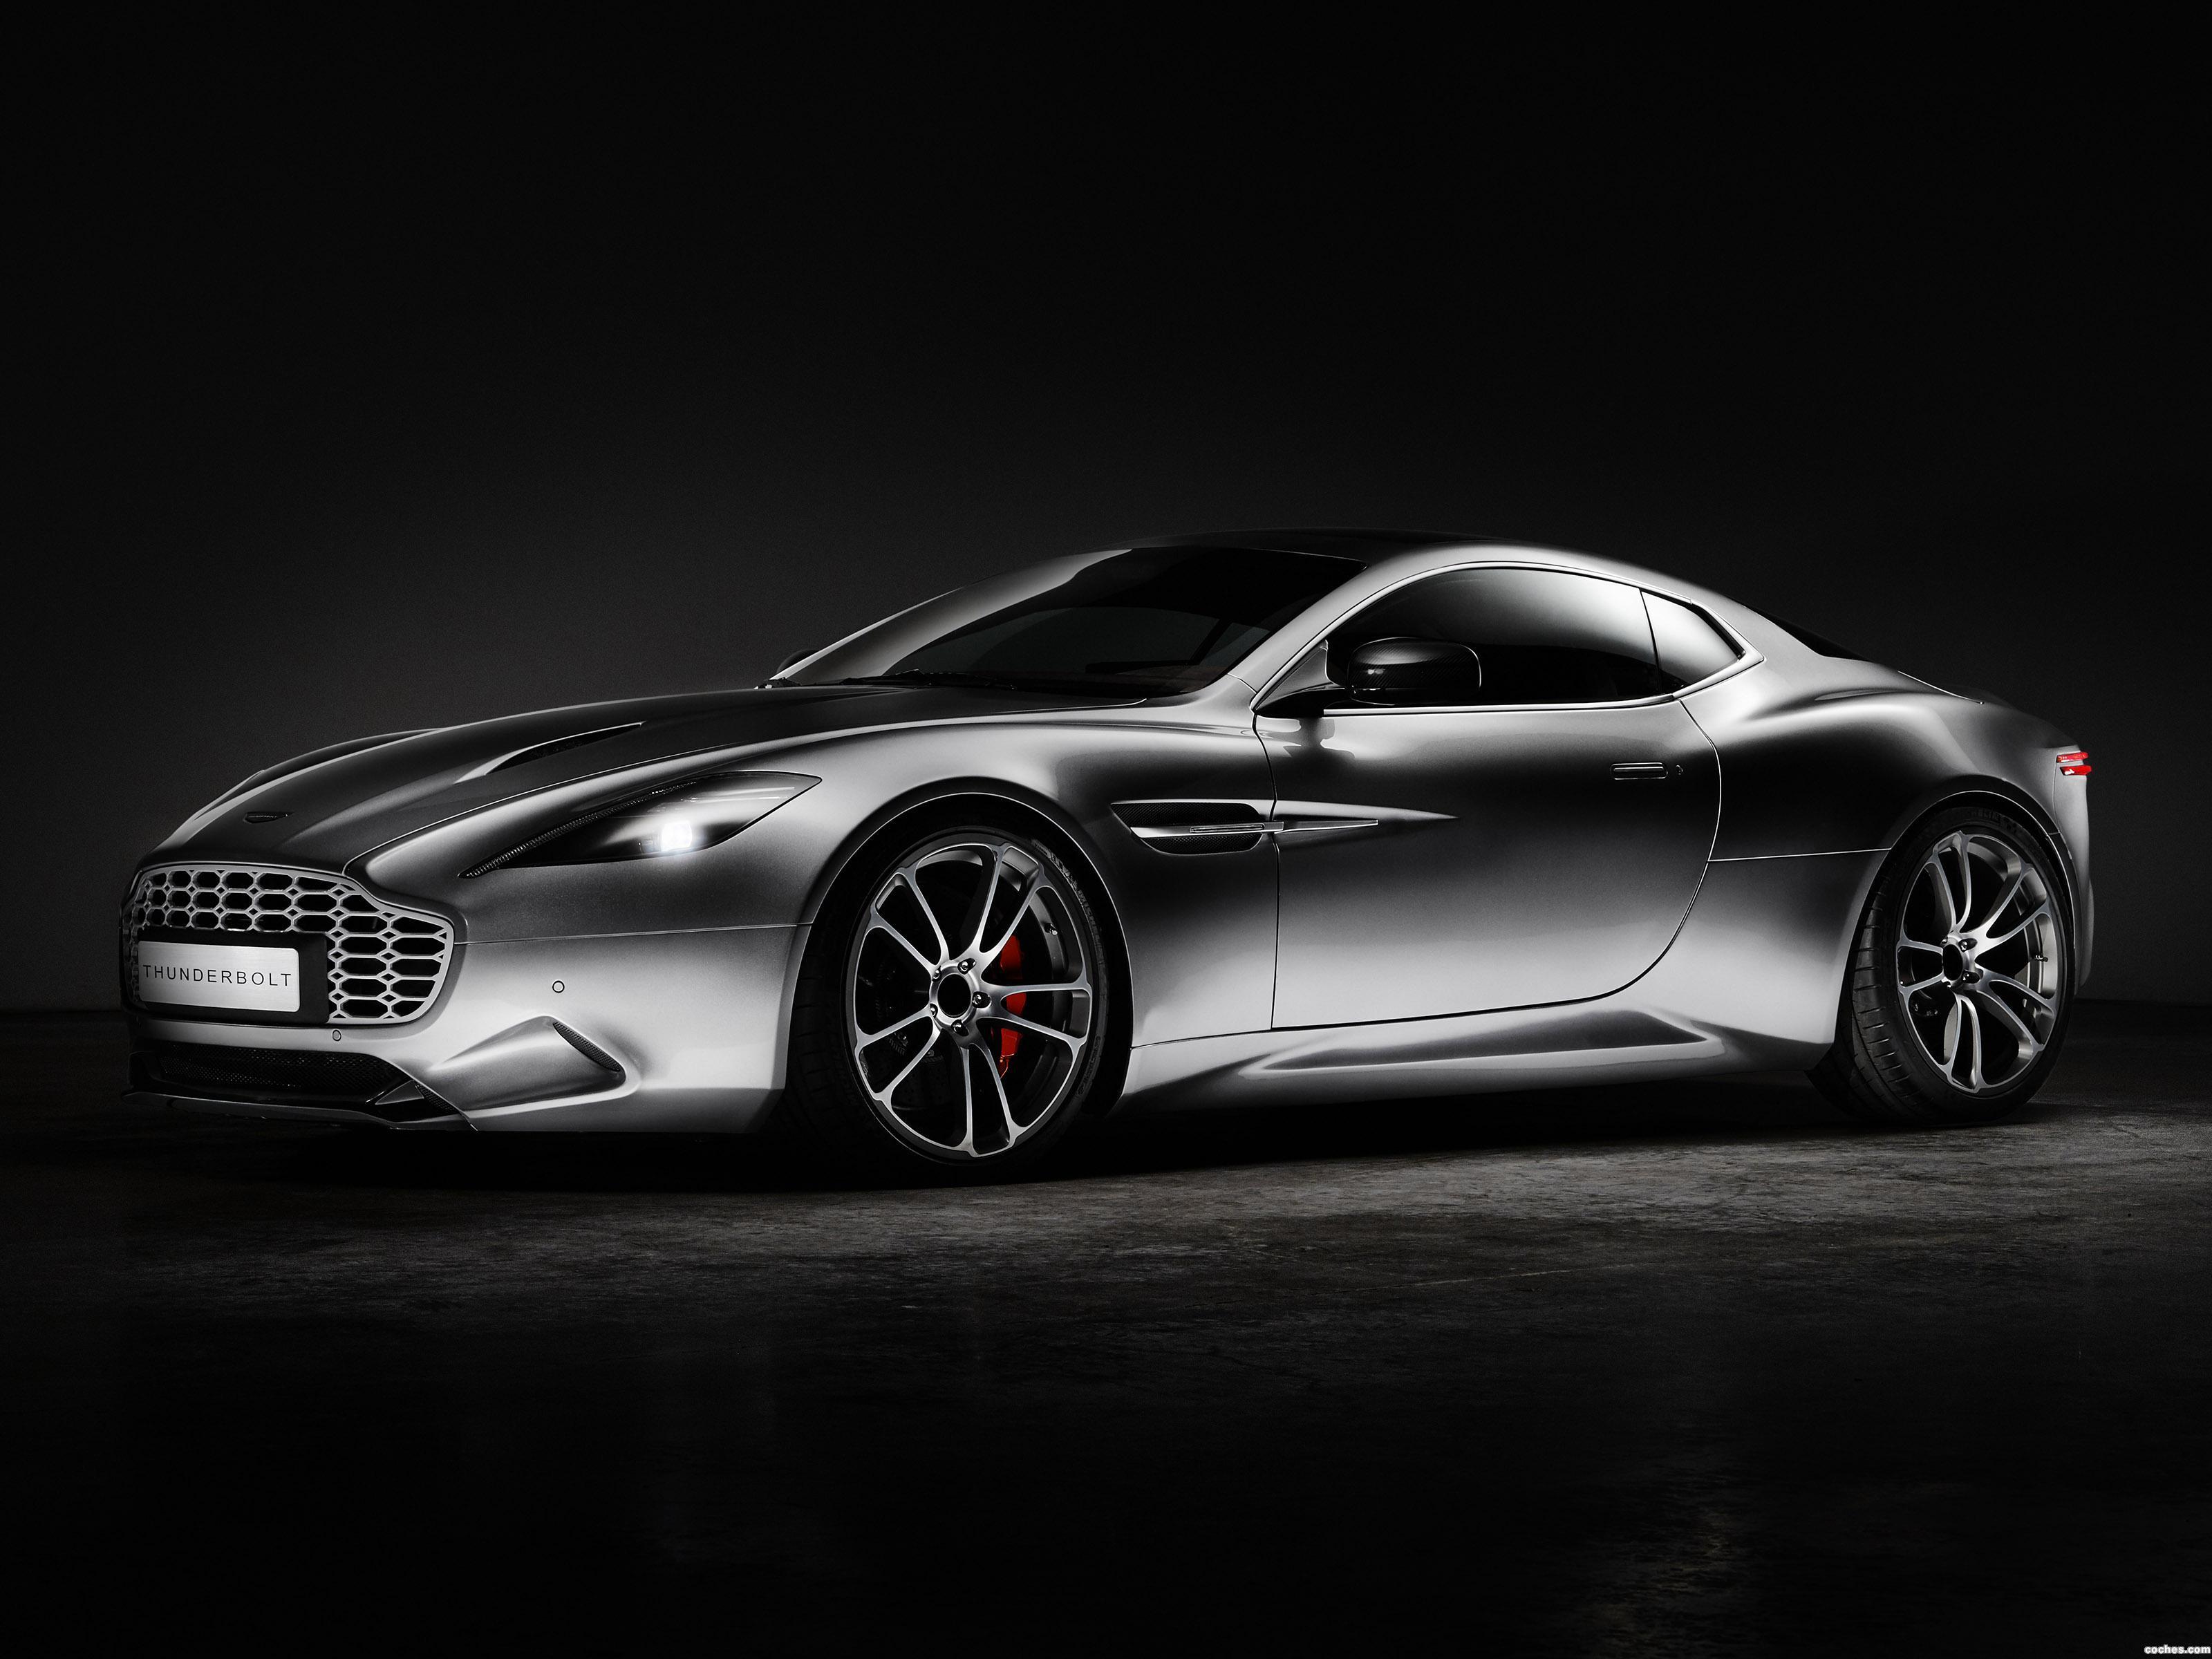 Foto 0 de Aston Martin Thunderbolt by Galpin 2015